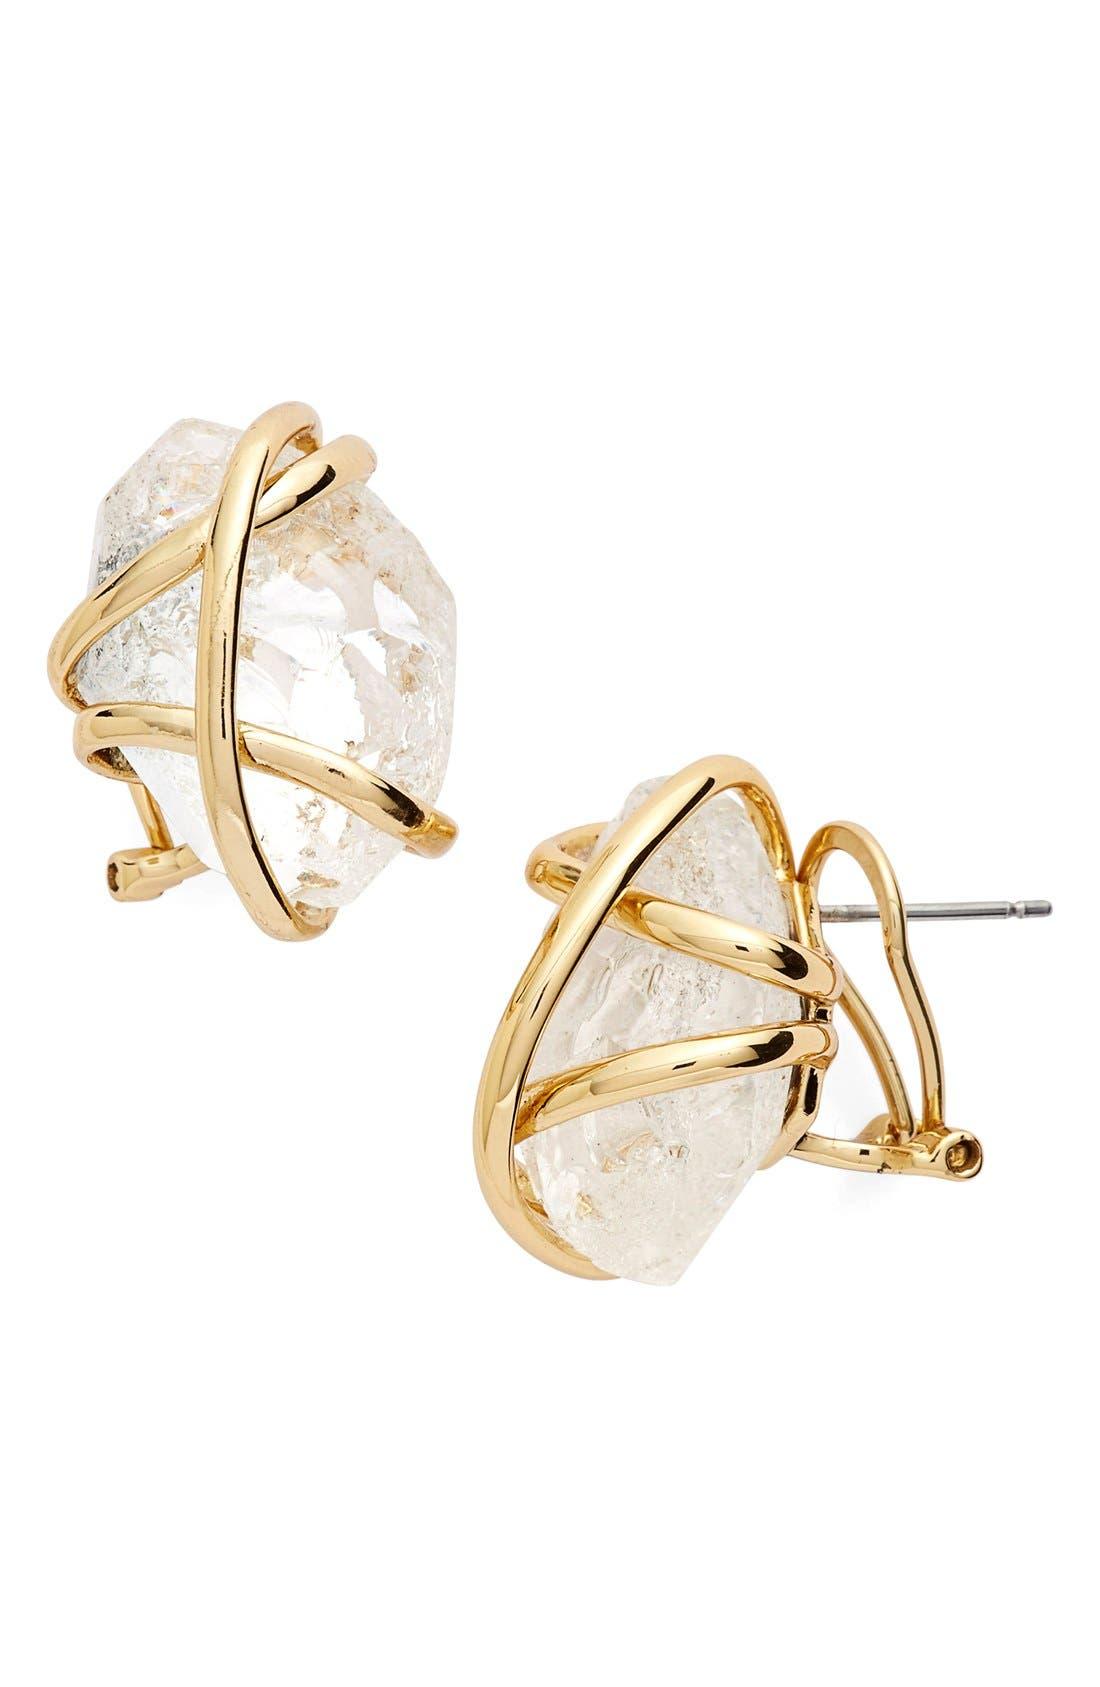 Alternate Image 1 Selected - Alexis Bittar 'Miss Havisham' Rough Cut Crystal Stud Earrings